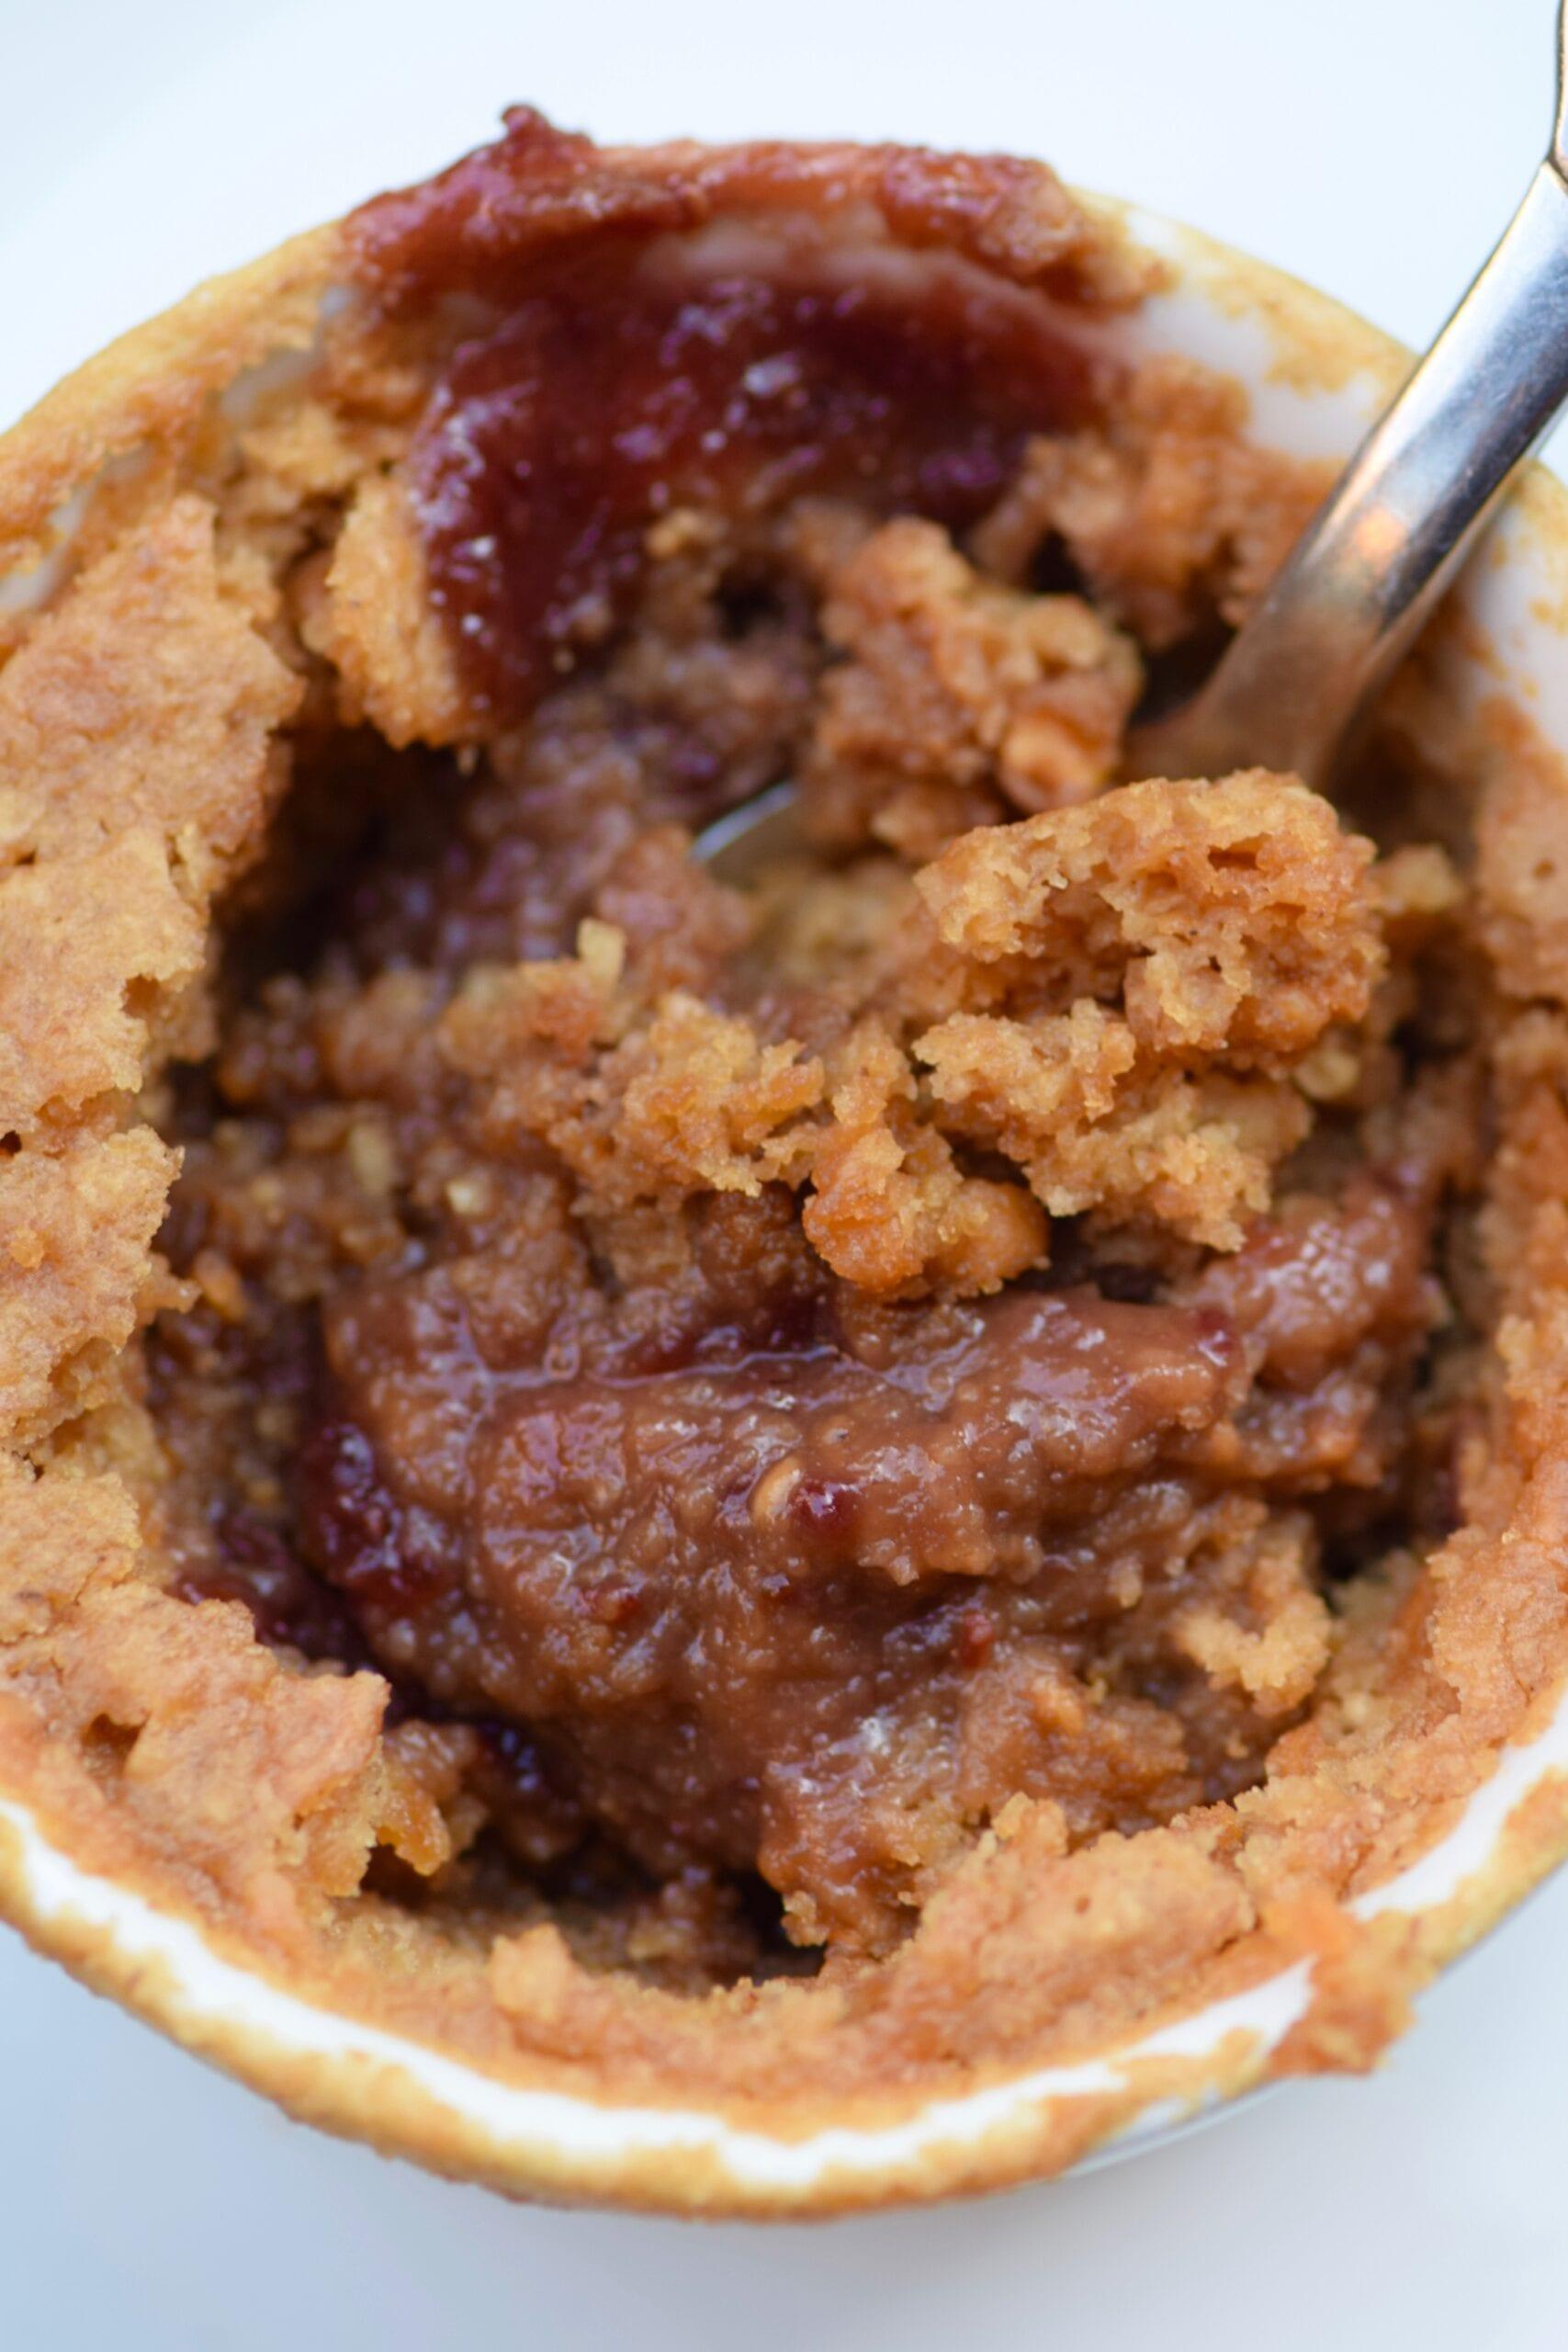 Peanut butter & jelly mug cake with spoon inside it